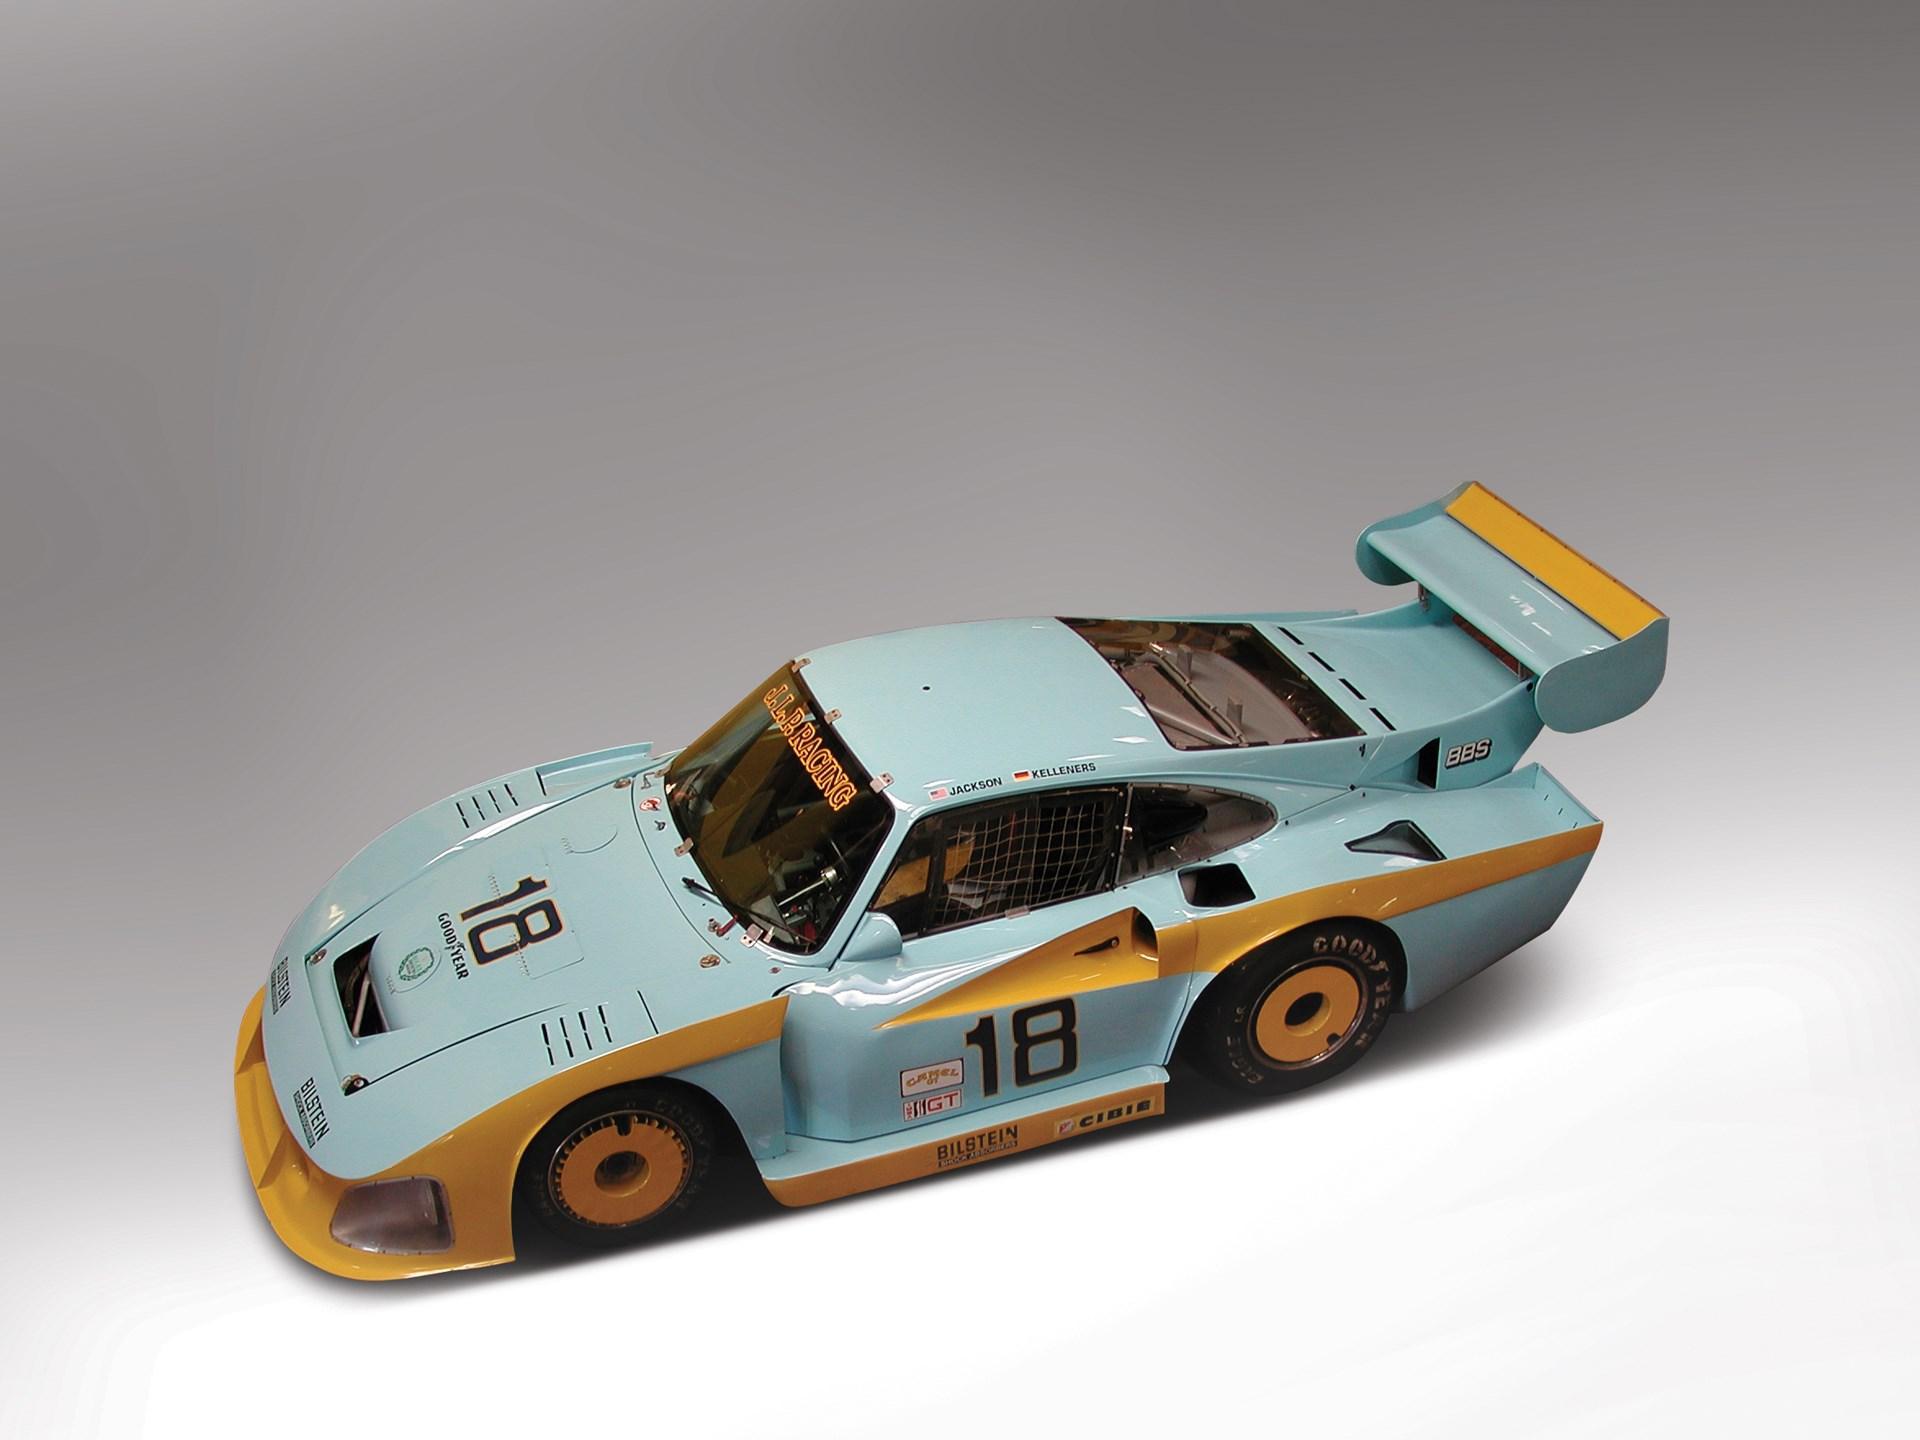 1981 Porsche 935 IMSA Group 5 Race Car